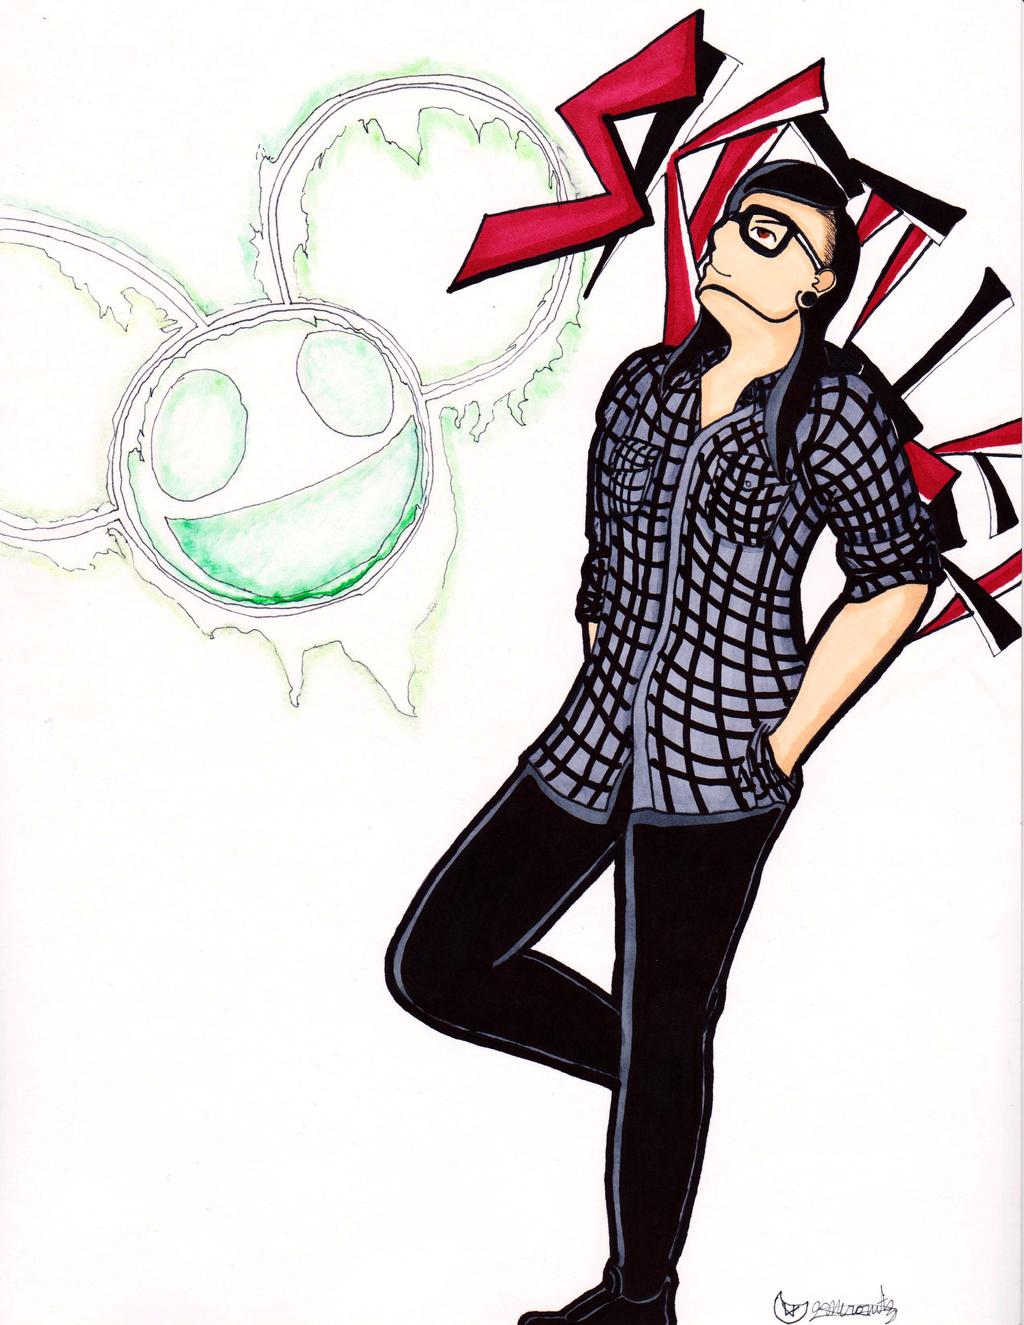 Skrillex/Deadmau5 Commission by kohakufire on DeviantArt